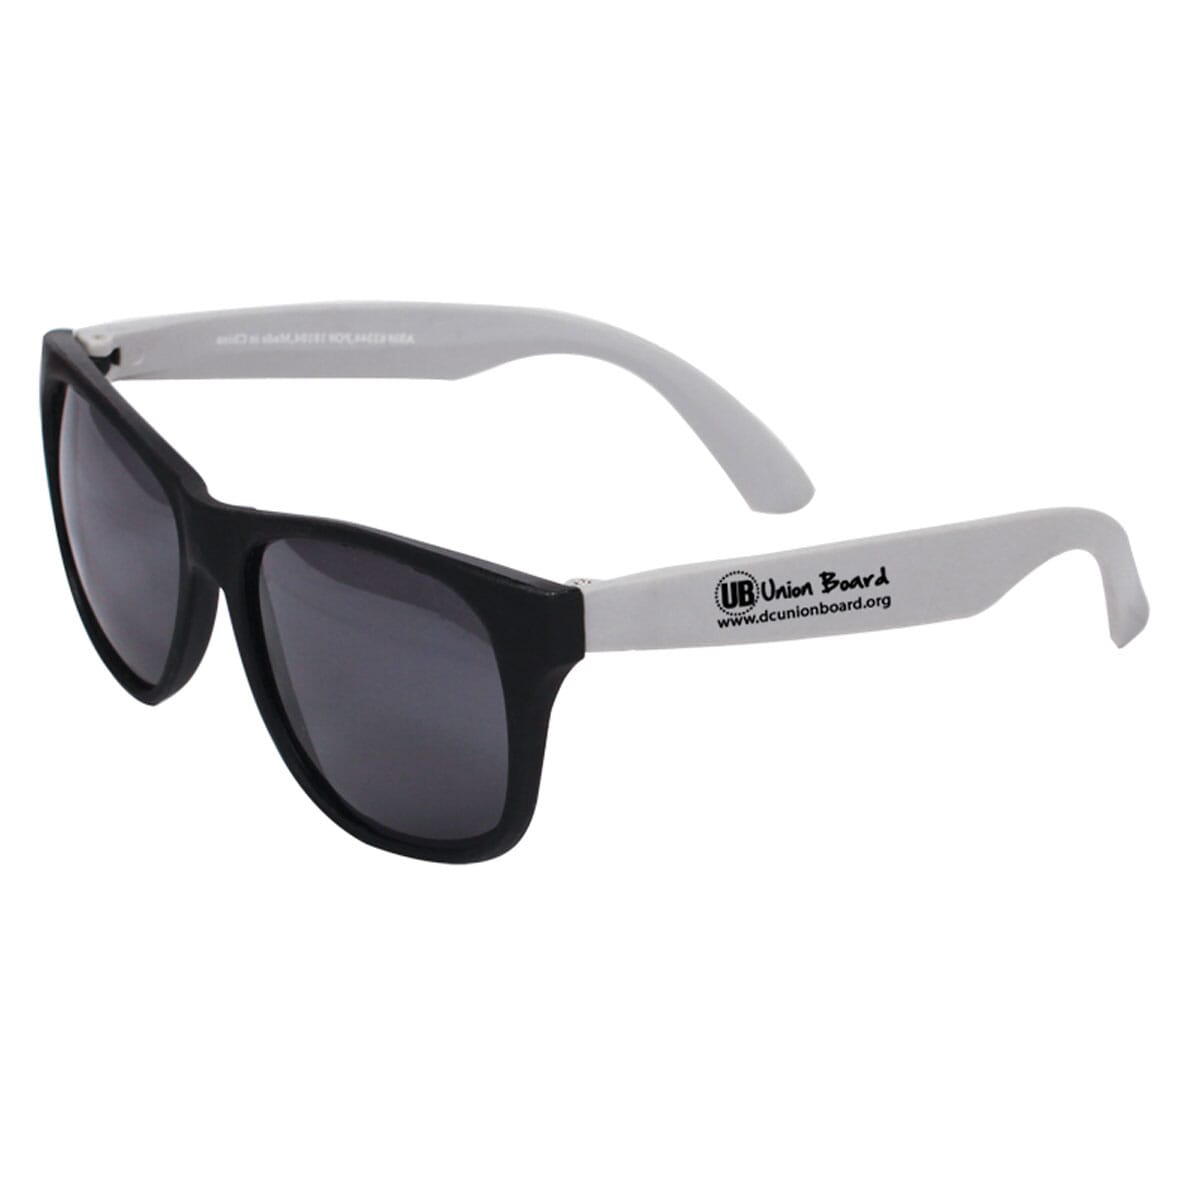 Tropical Sunglasses